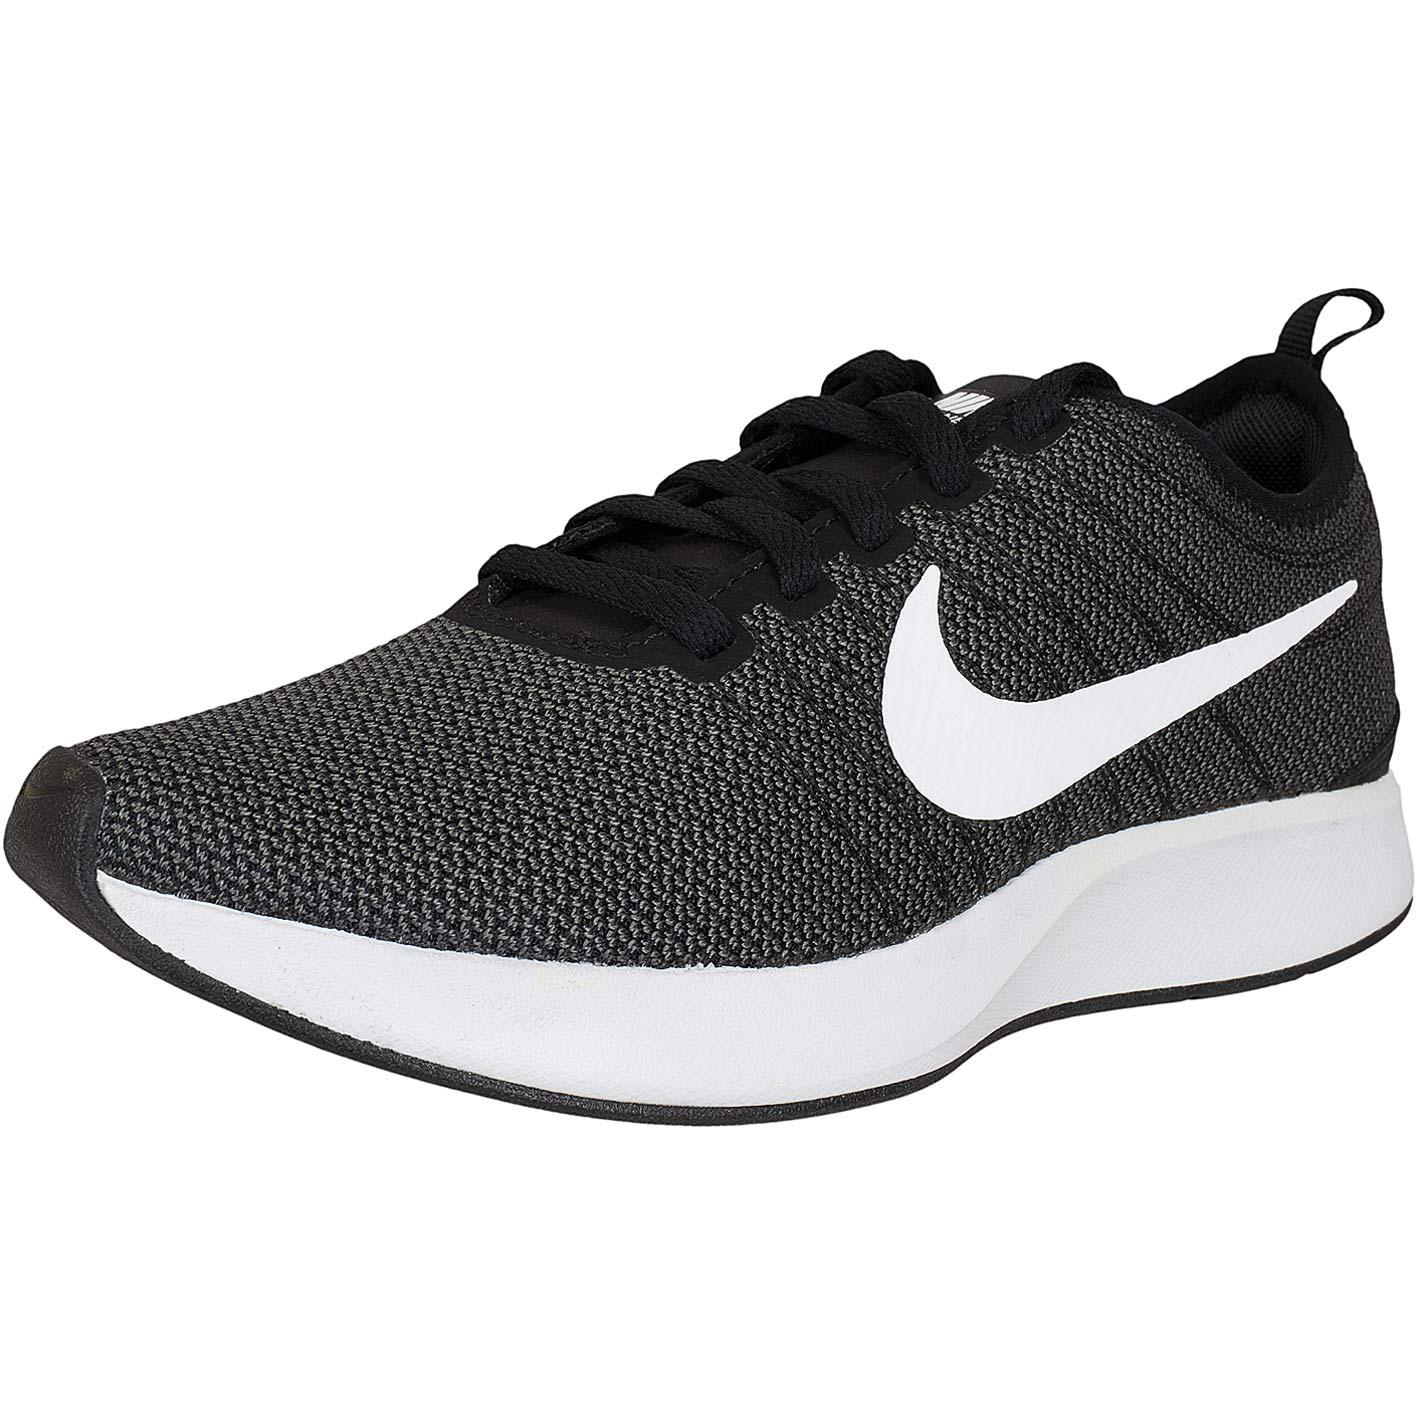 e7f1a69a689d ☆ Nike Damen Sneaker Dualtone Racer schwarz weiß - hier bestellen!